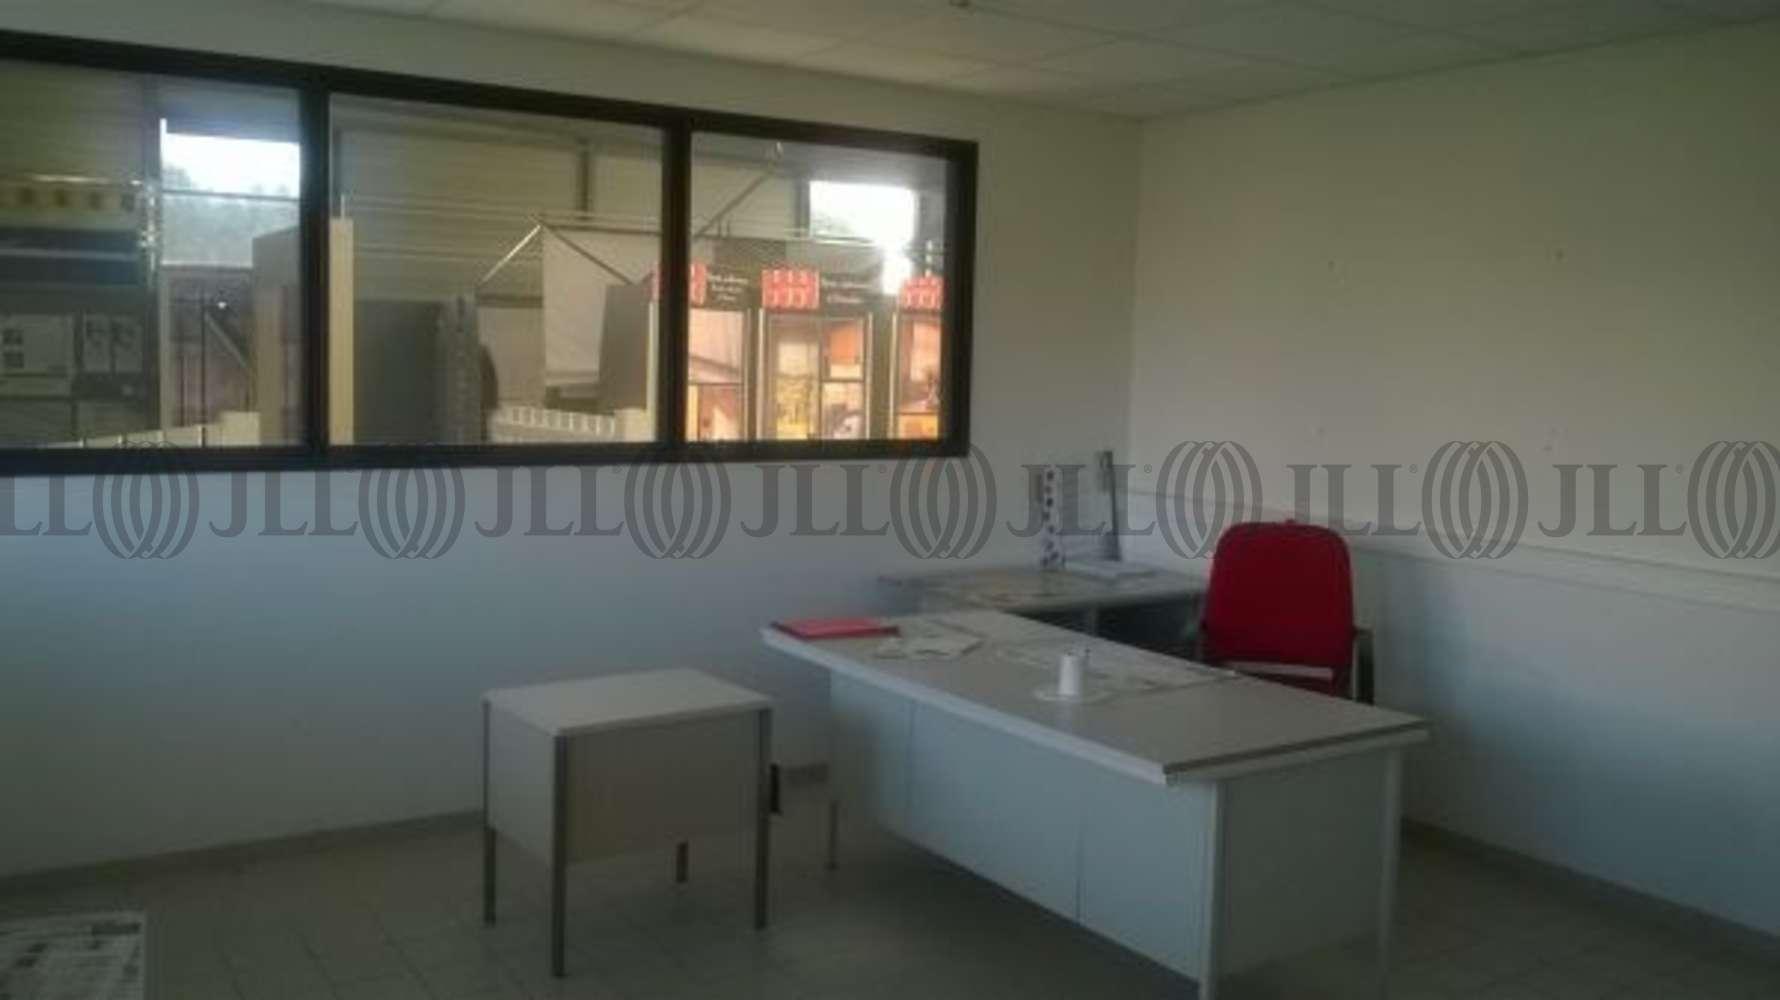 Activités/entrepôt Plerin, 22190 - PLERIN - 8238767